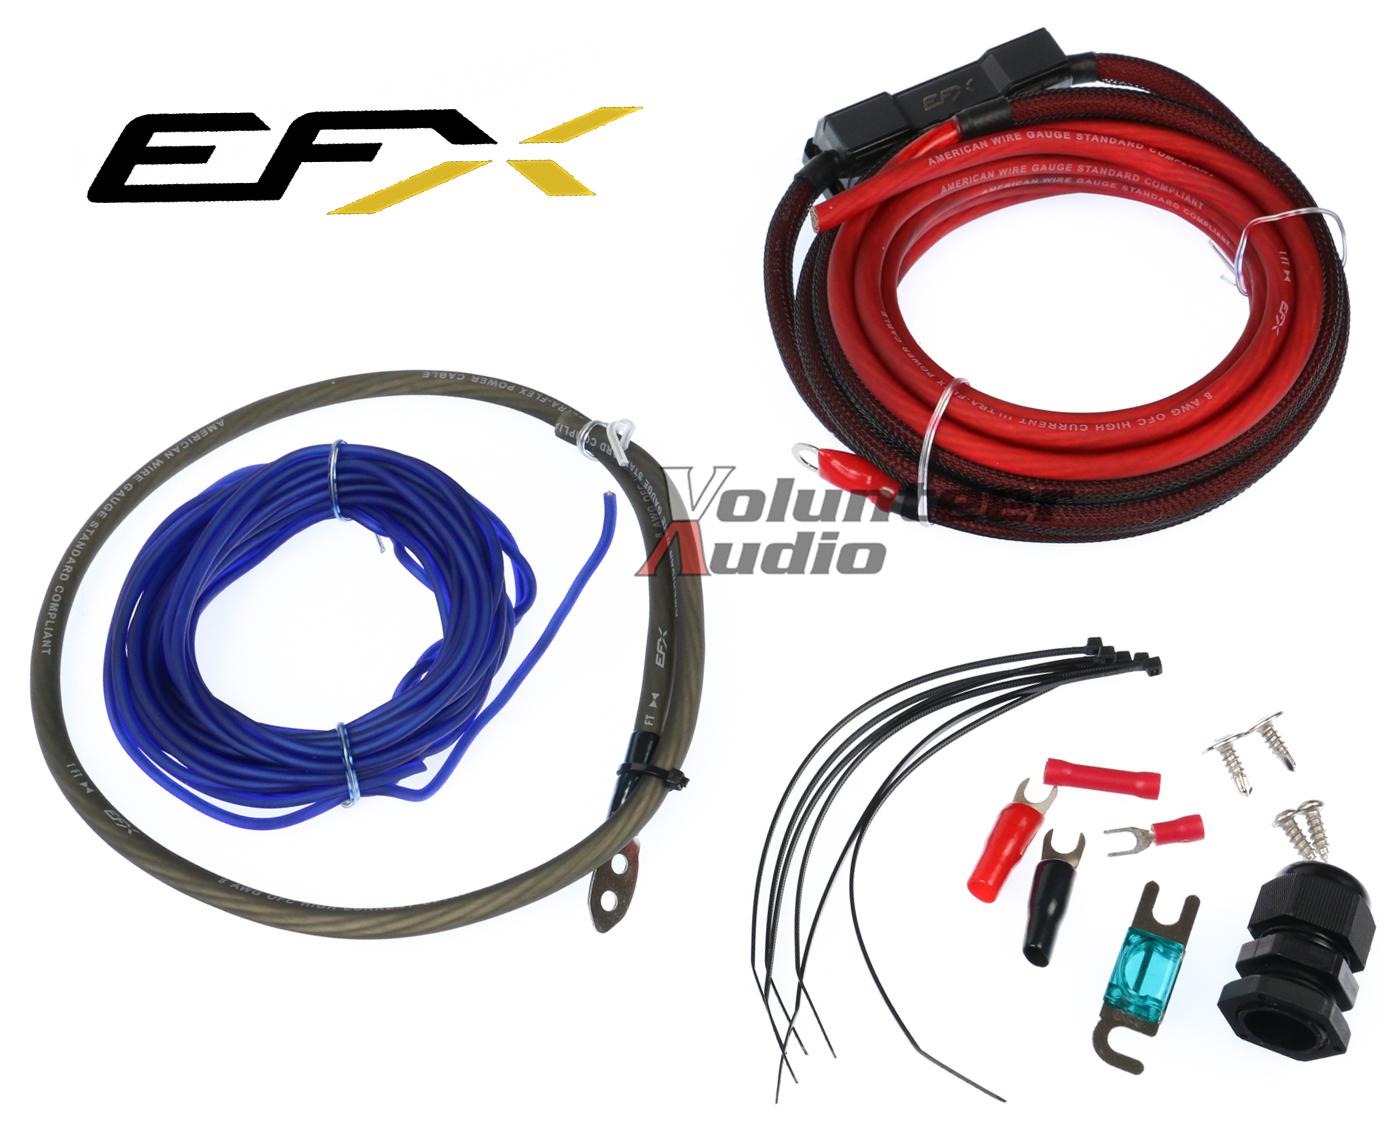 details about efx 8ga ofc amp kit efxakc8b 60amp remote wire spade  terminals bulkhead